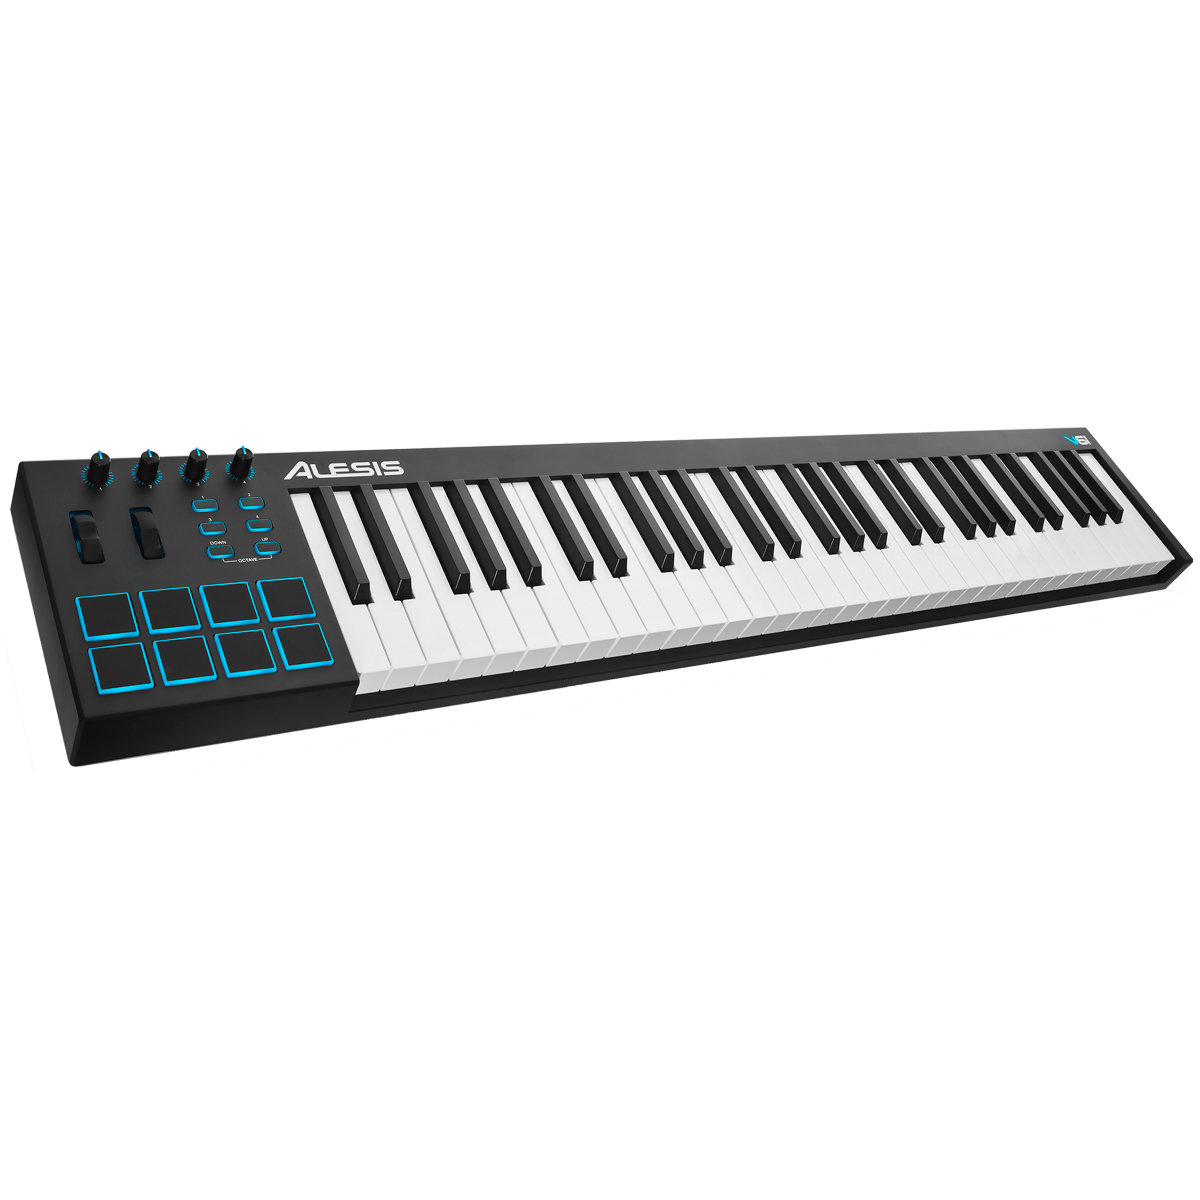 V61 - Teclado Controlador MIDI / USB V 61 - Alesis